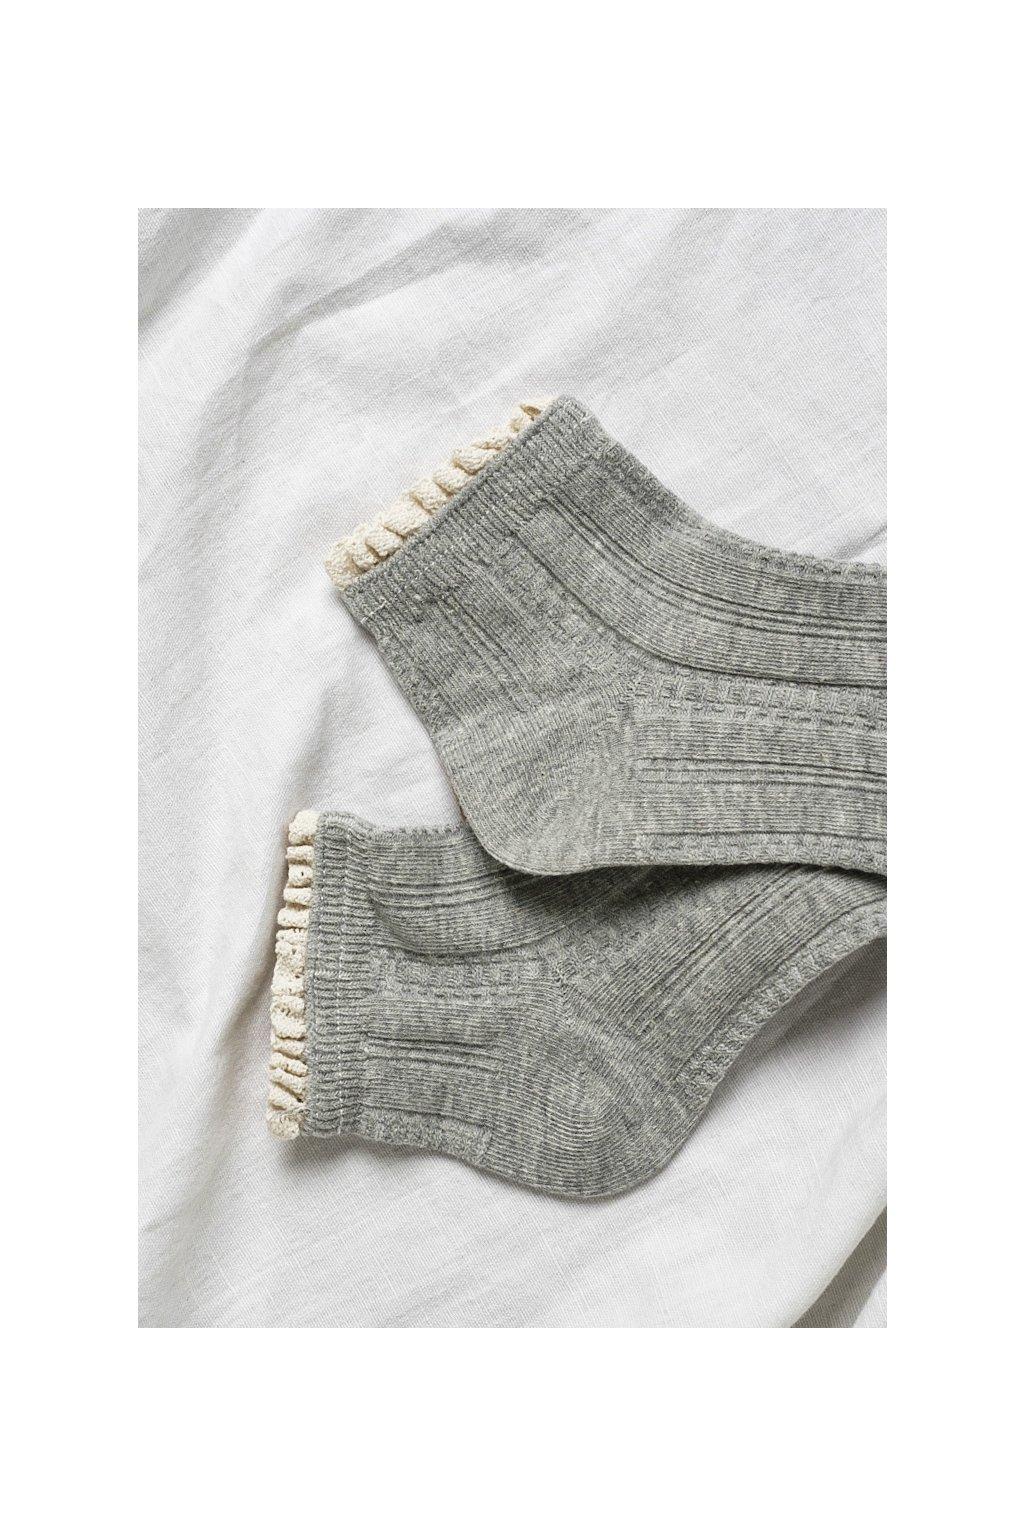 Ponožky sivé 1pár